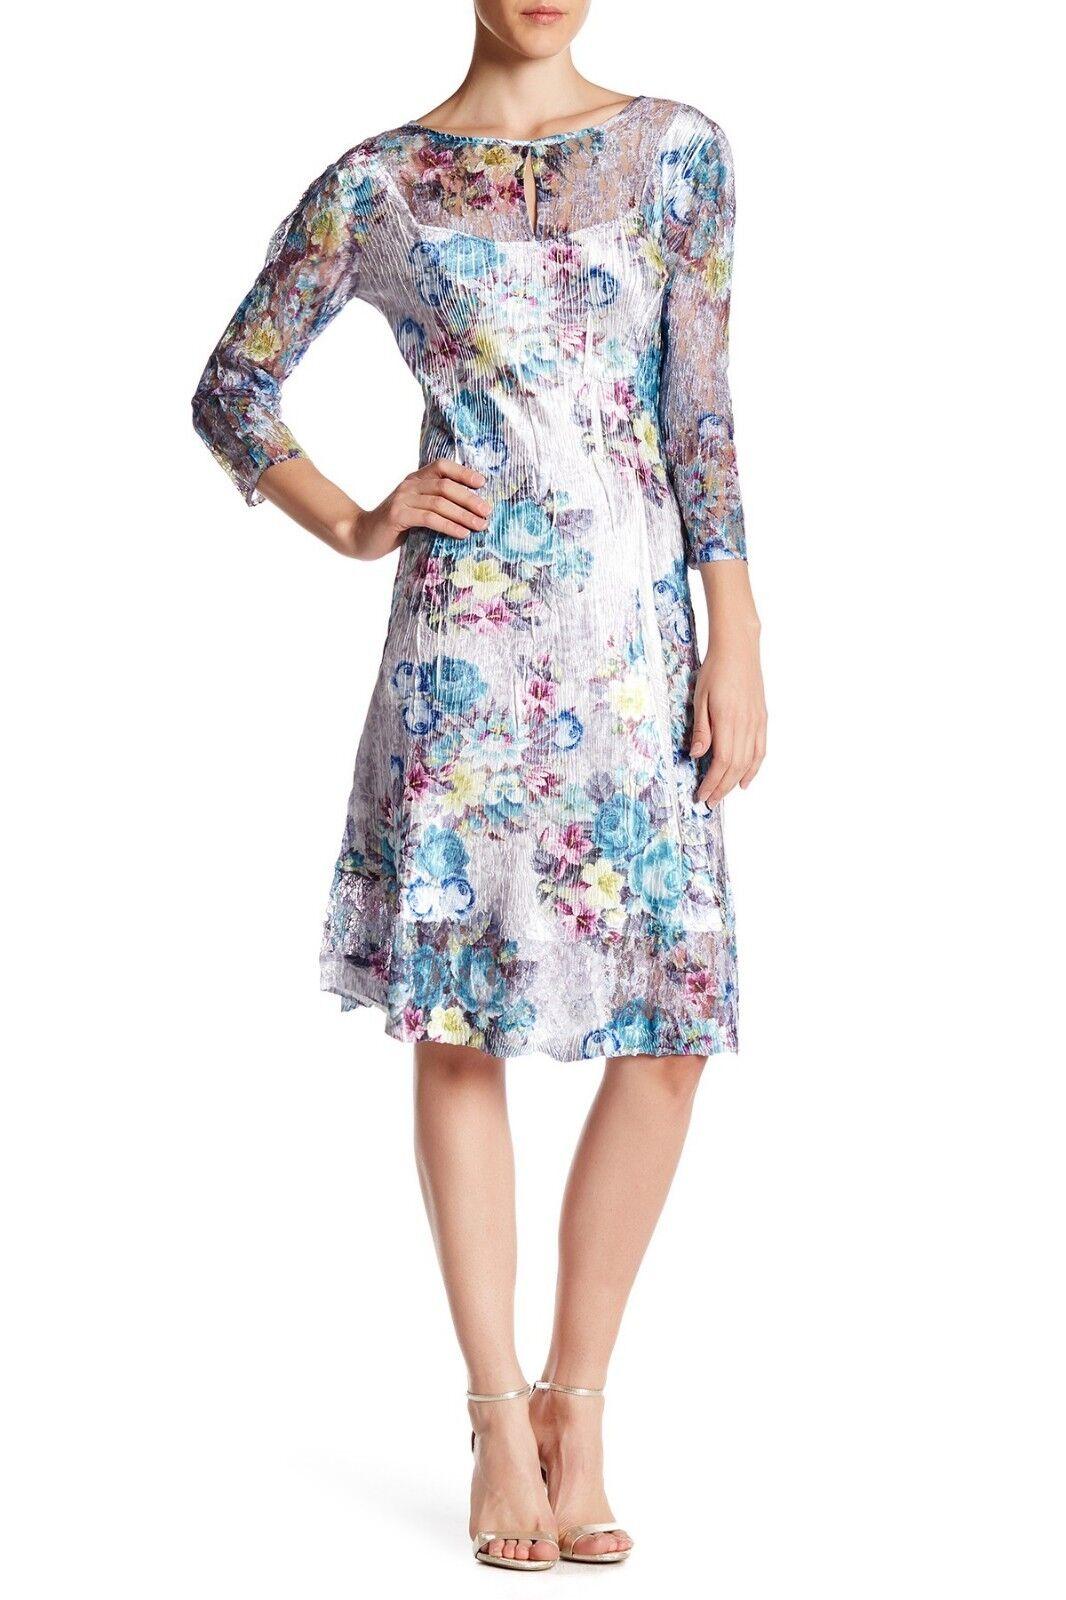 300 KOMAROV Floral Print Dress 3  4 spetsärm Keyhole bröllop Romantic TGG